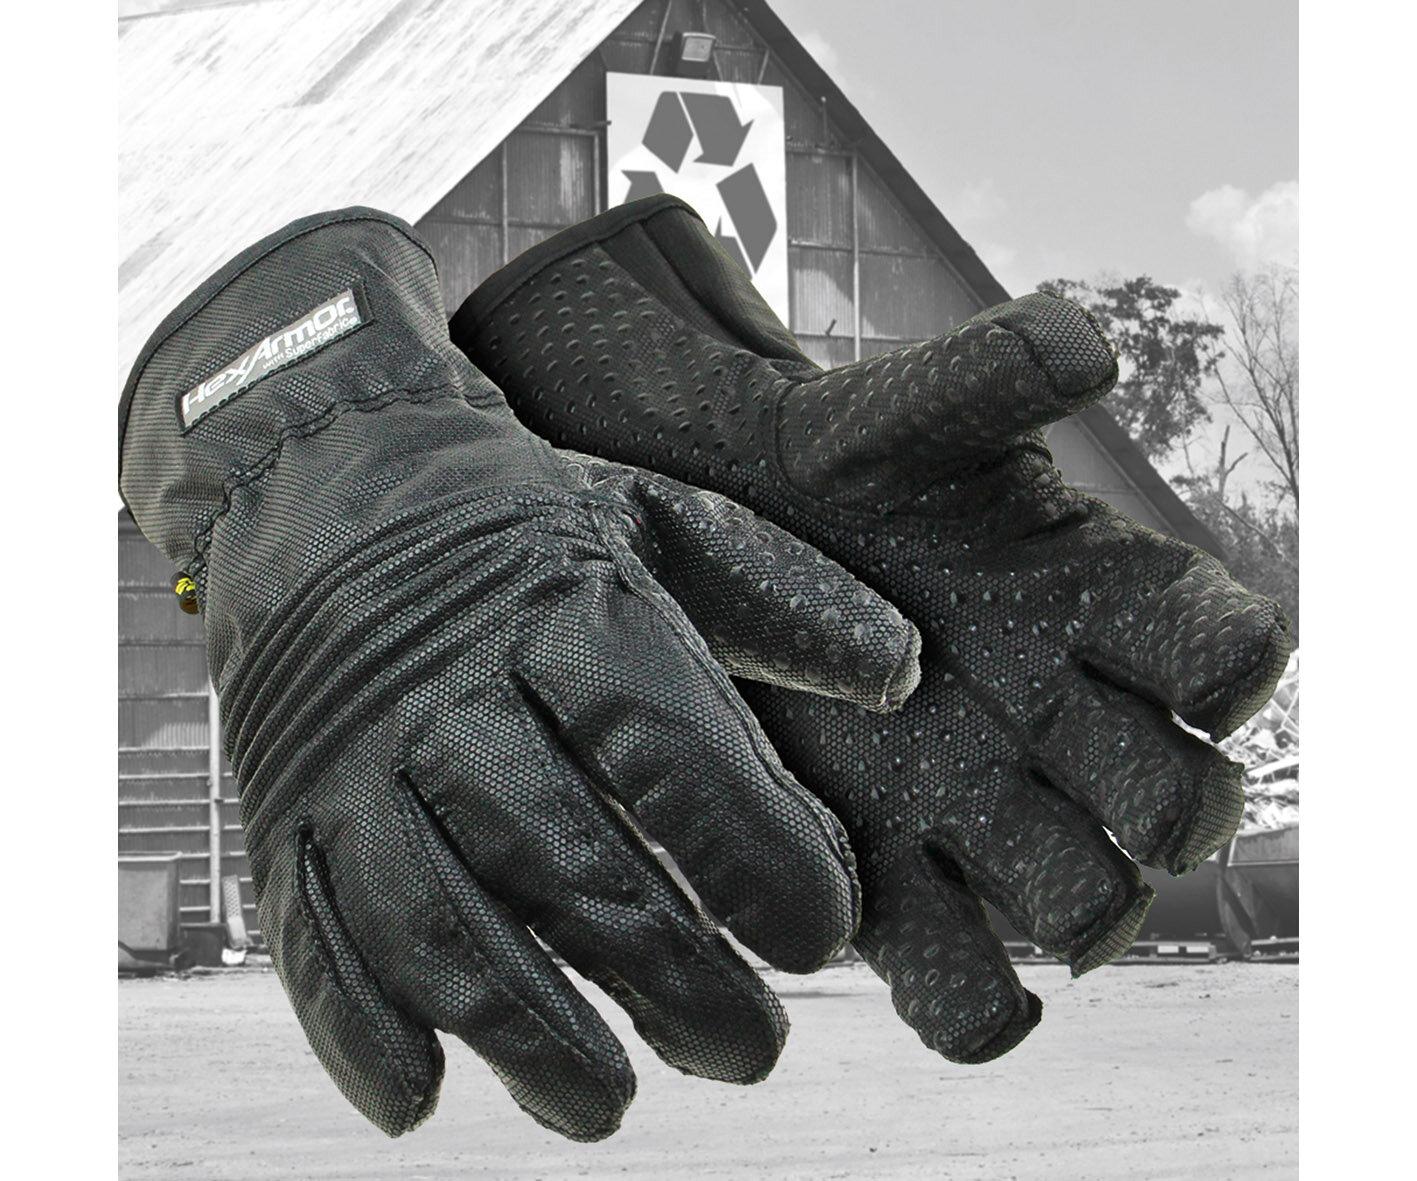 Hexarmor 3041 Anti Syringe Glove